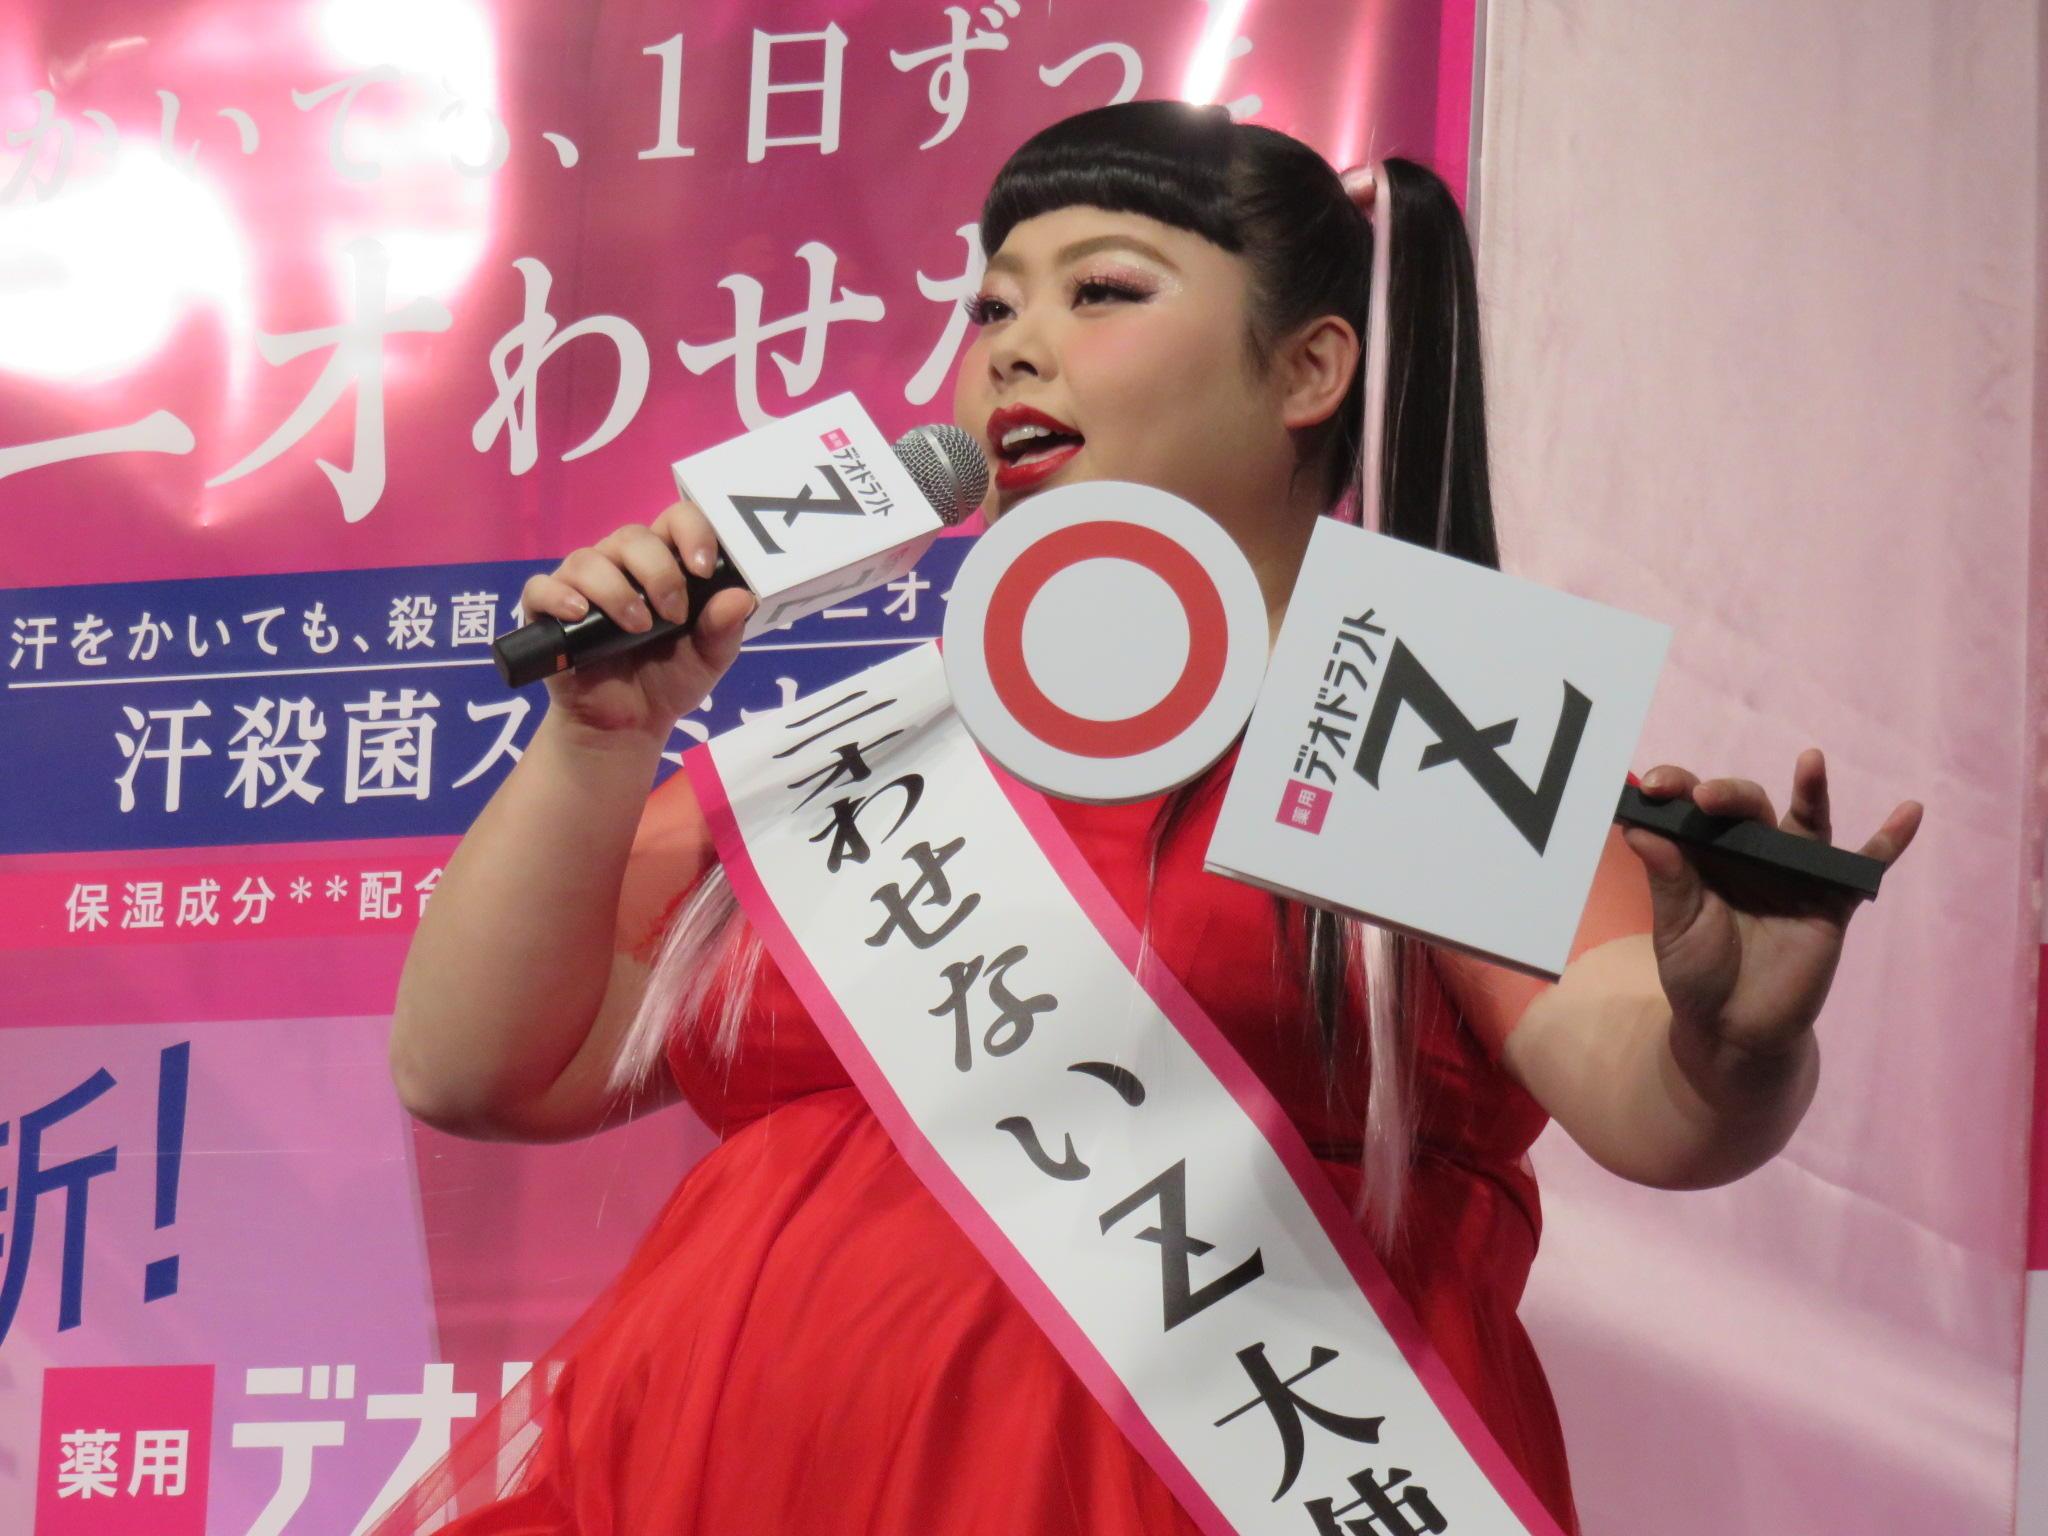 http://news.yoshimoto.co.jp/20170216183254-3a71b25b02971a2b57612c9f1a25e13de79f78a7.jpg